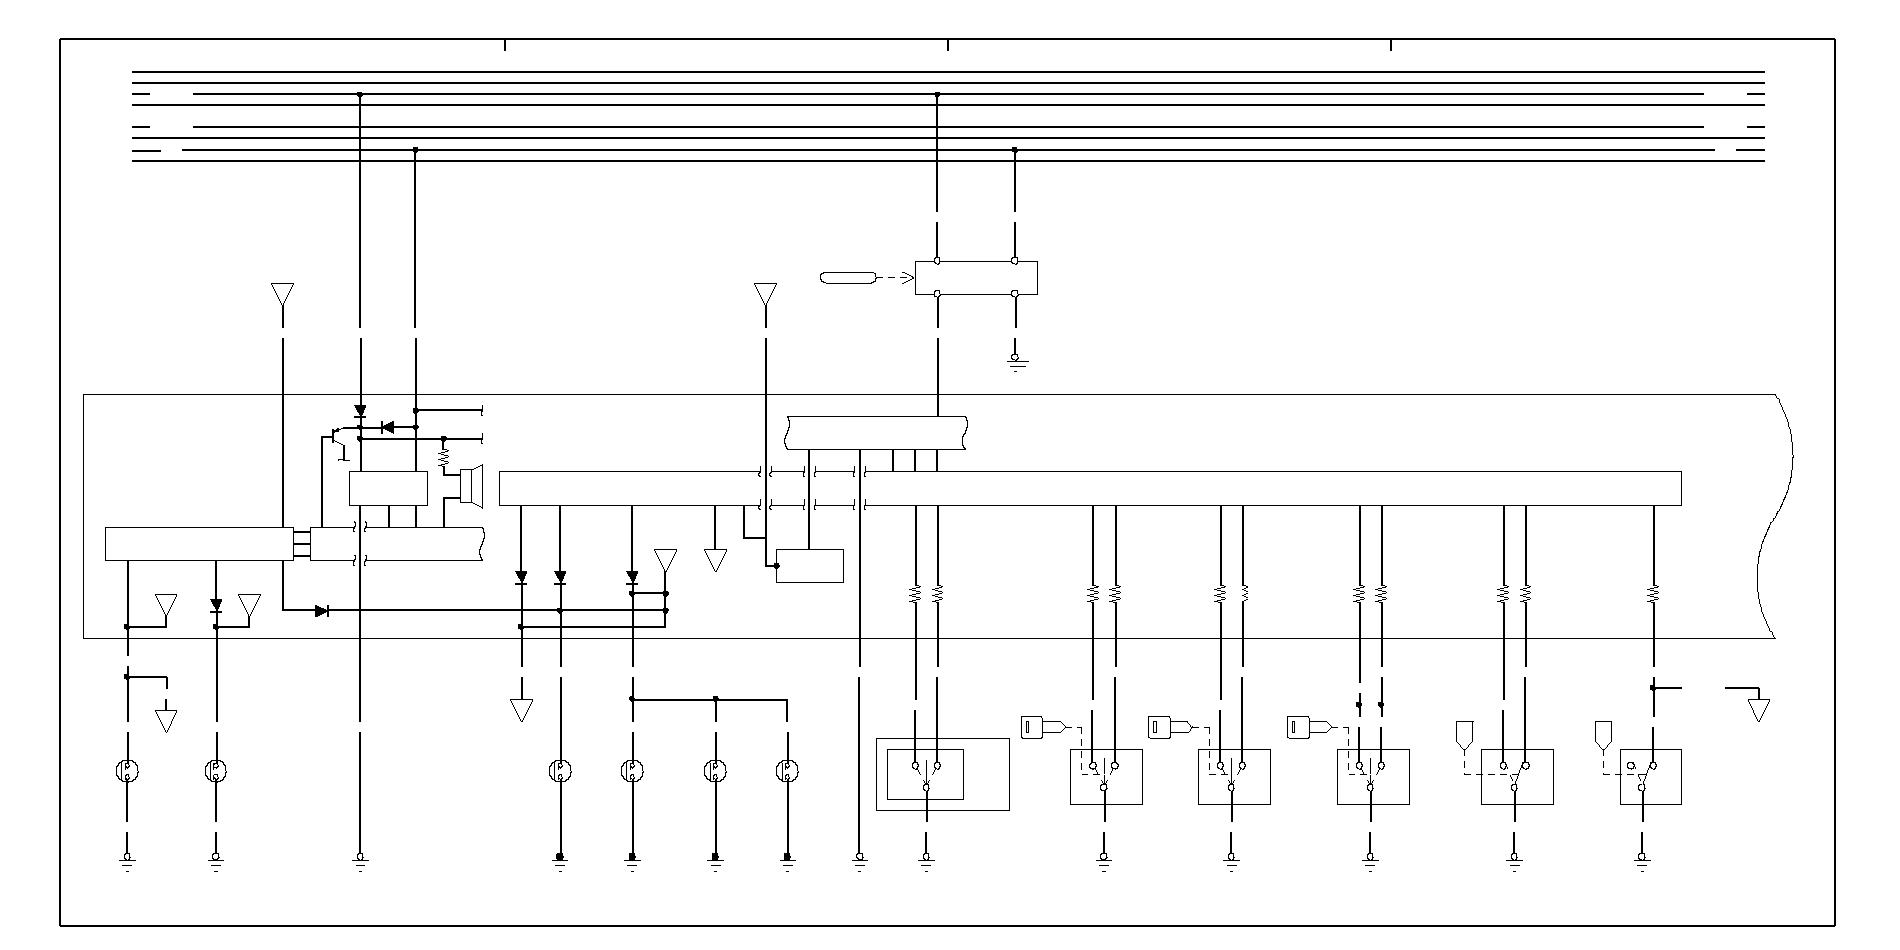 Honda Jazz Door Wiring Diagram : Honda jazz wiring diagram manual torzone org auto